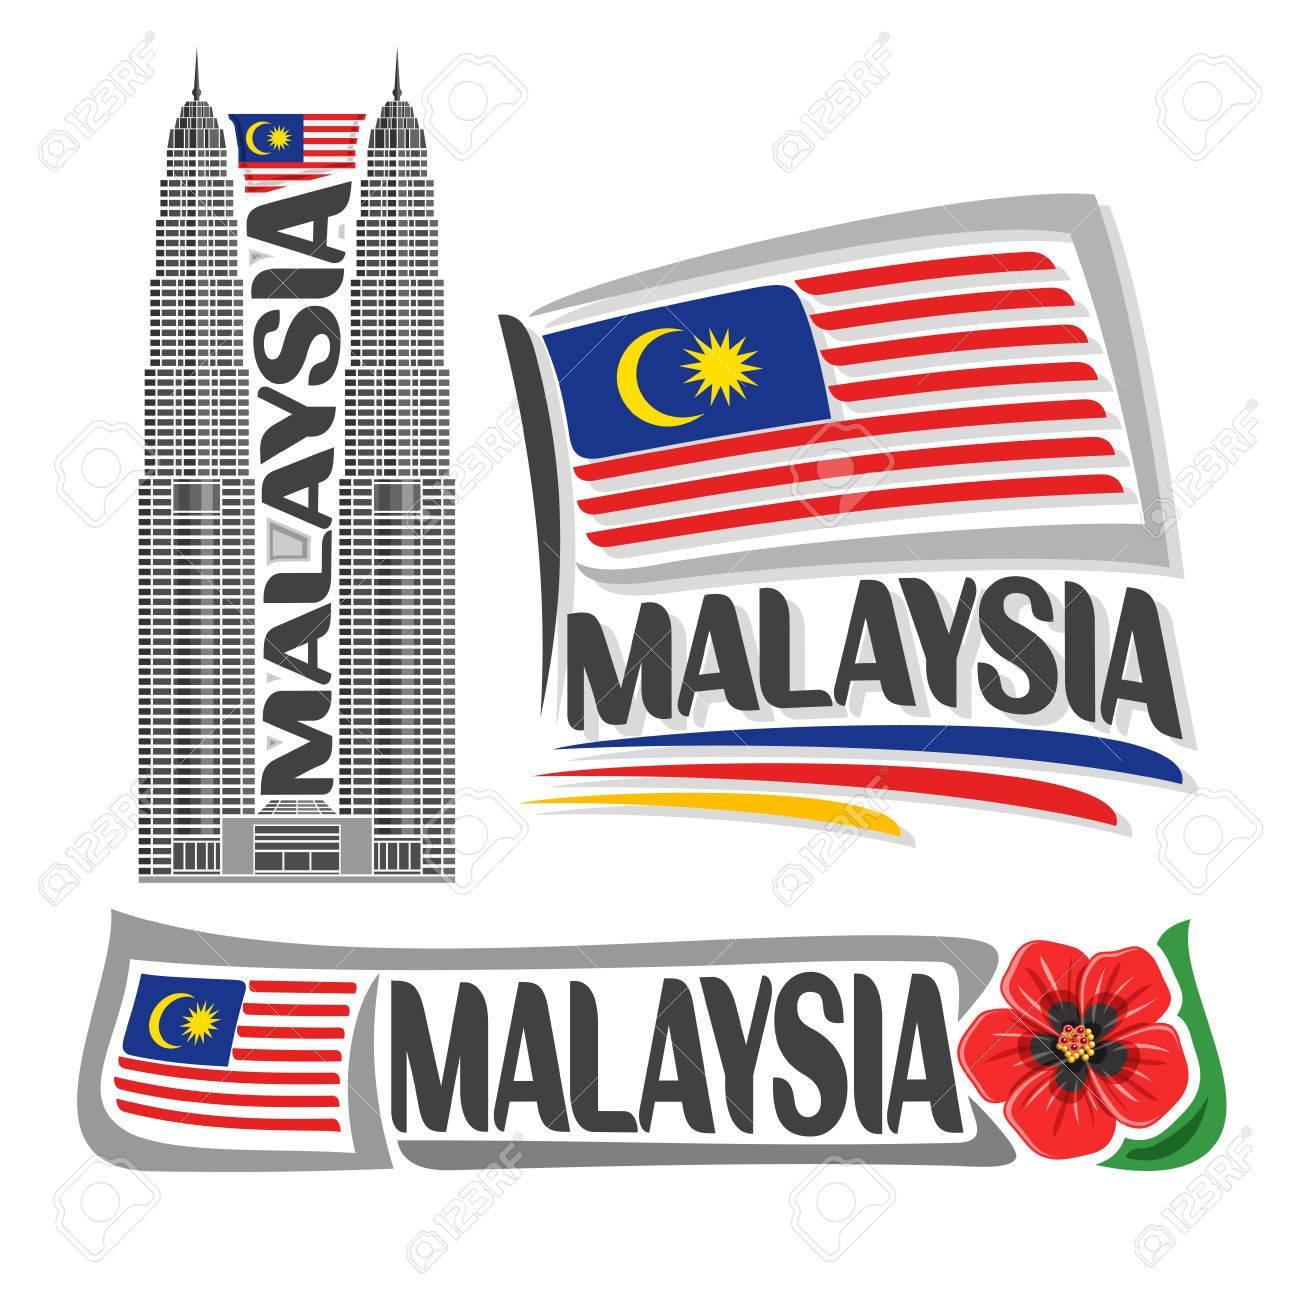 Vector logo malaysia 3 isolated images vertical banner skyline vector logo malaysia 3 isolated images vertical banner skyline petronas twin towers on malaysian buycottarizona Gallery